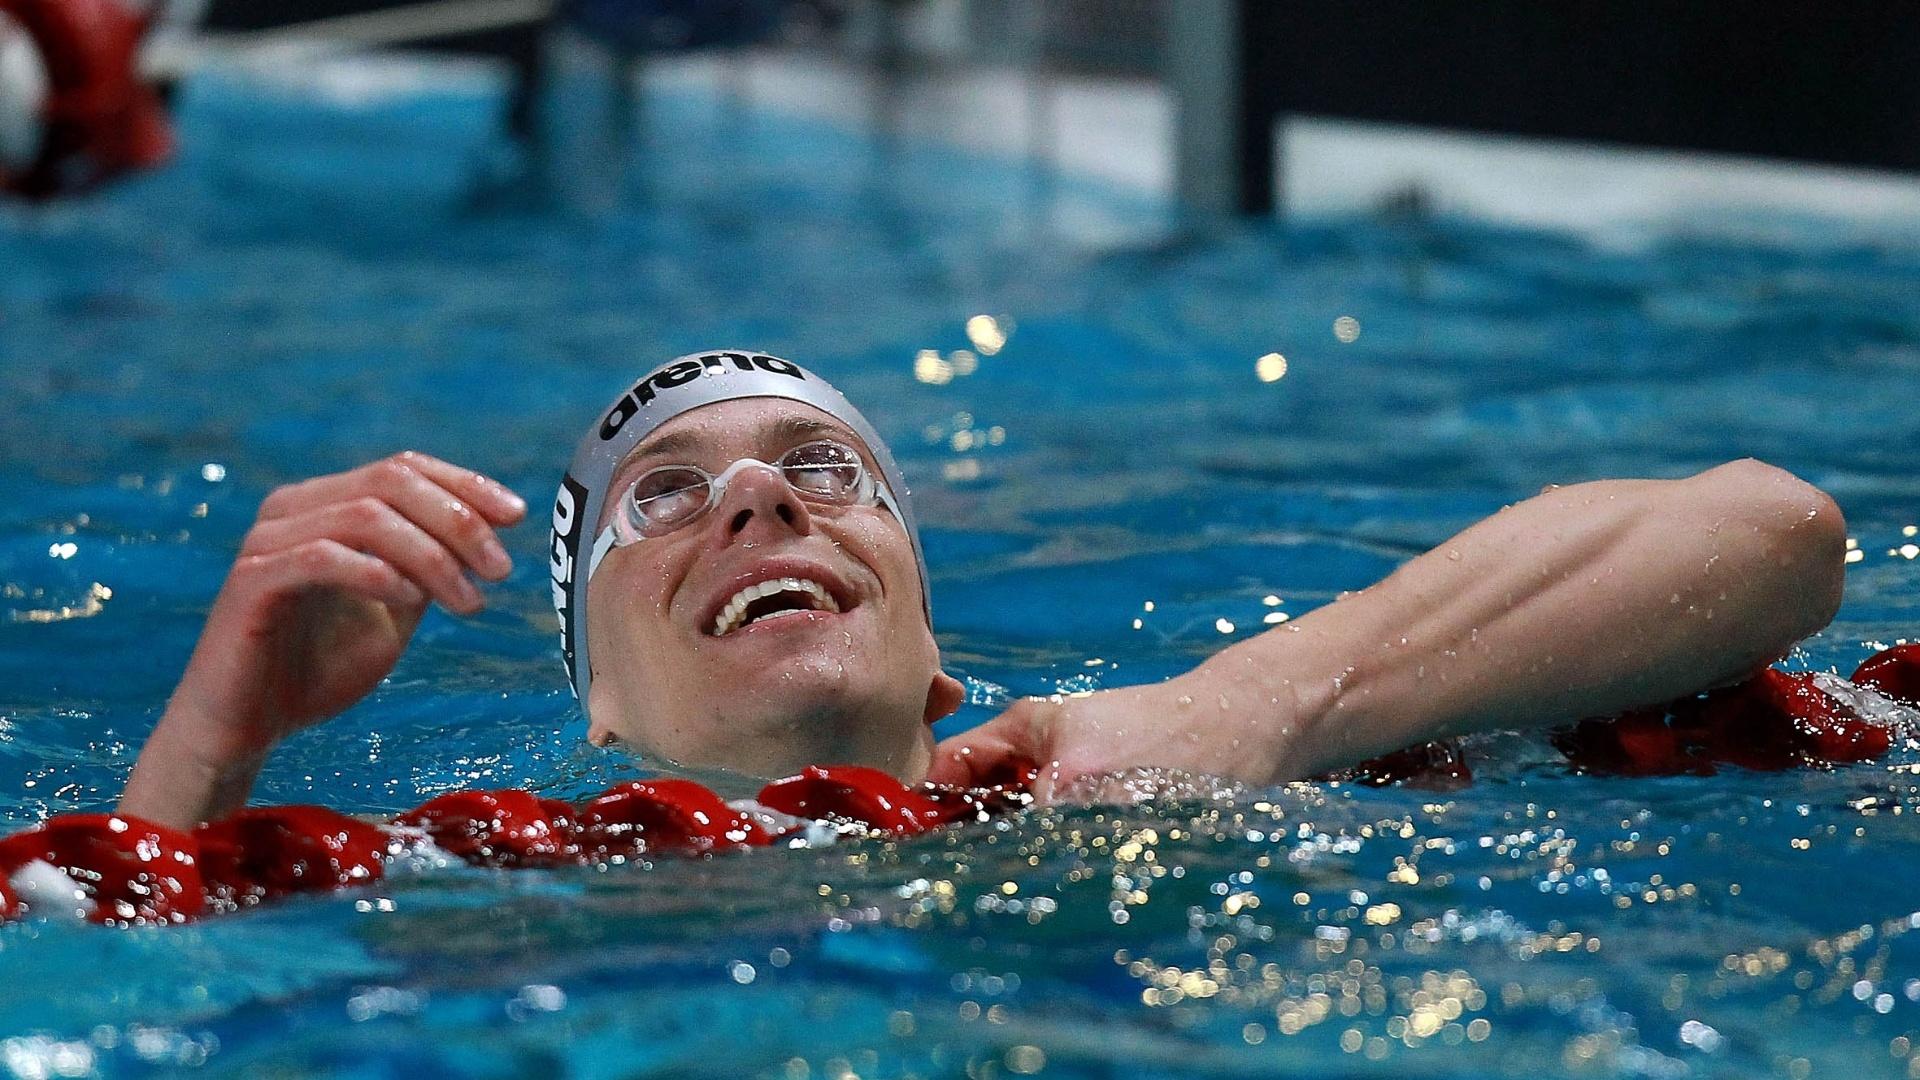 Cesar Cielo, ainda na piscina, sorri após a vitória nos 50 m livre no Trofeu José Finkel